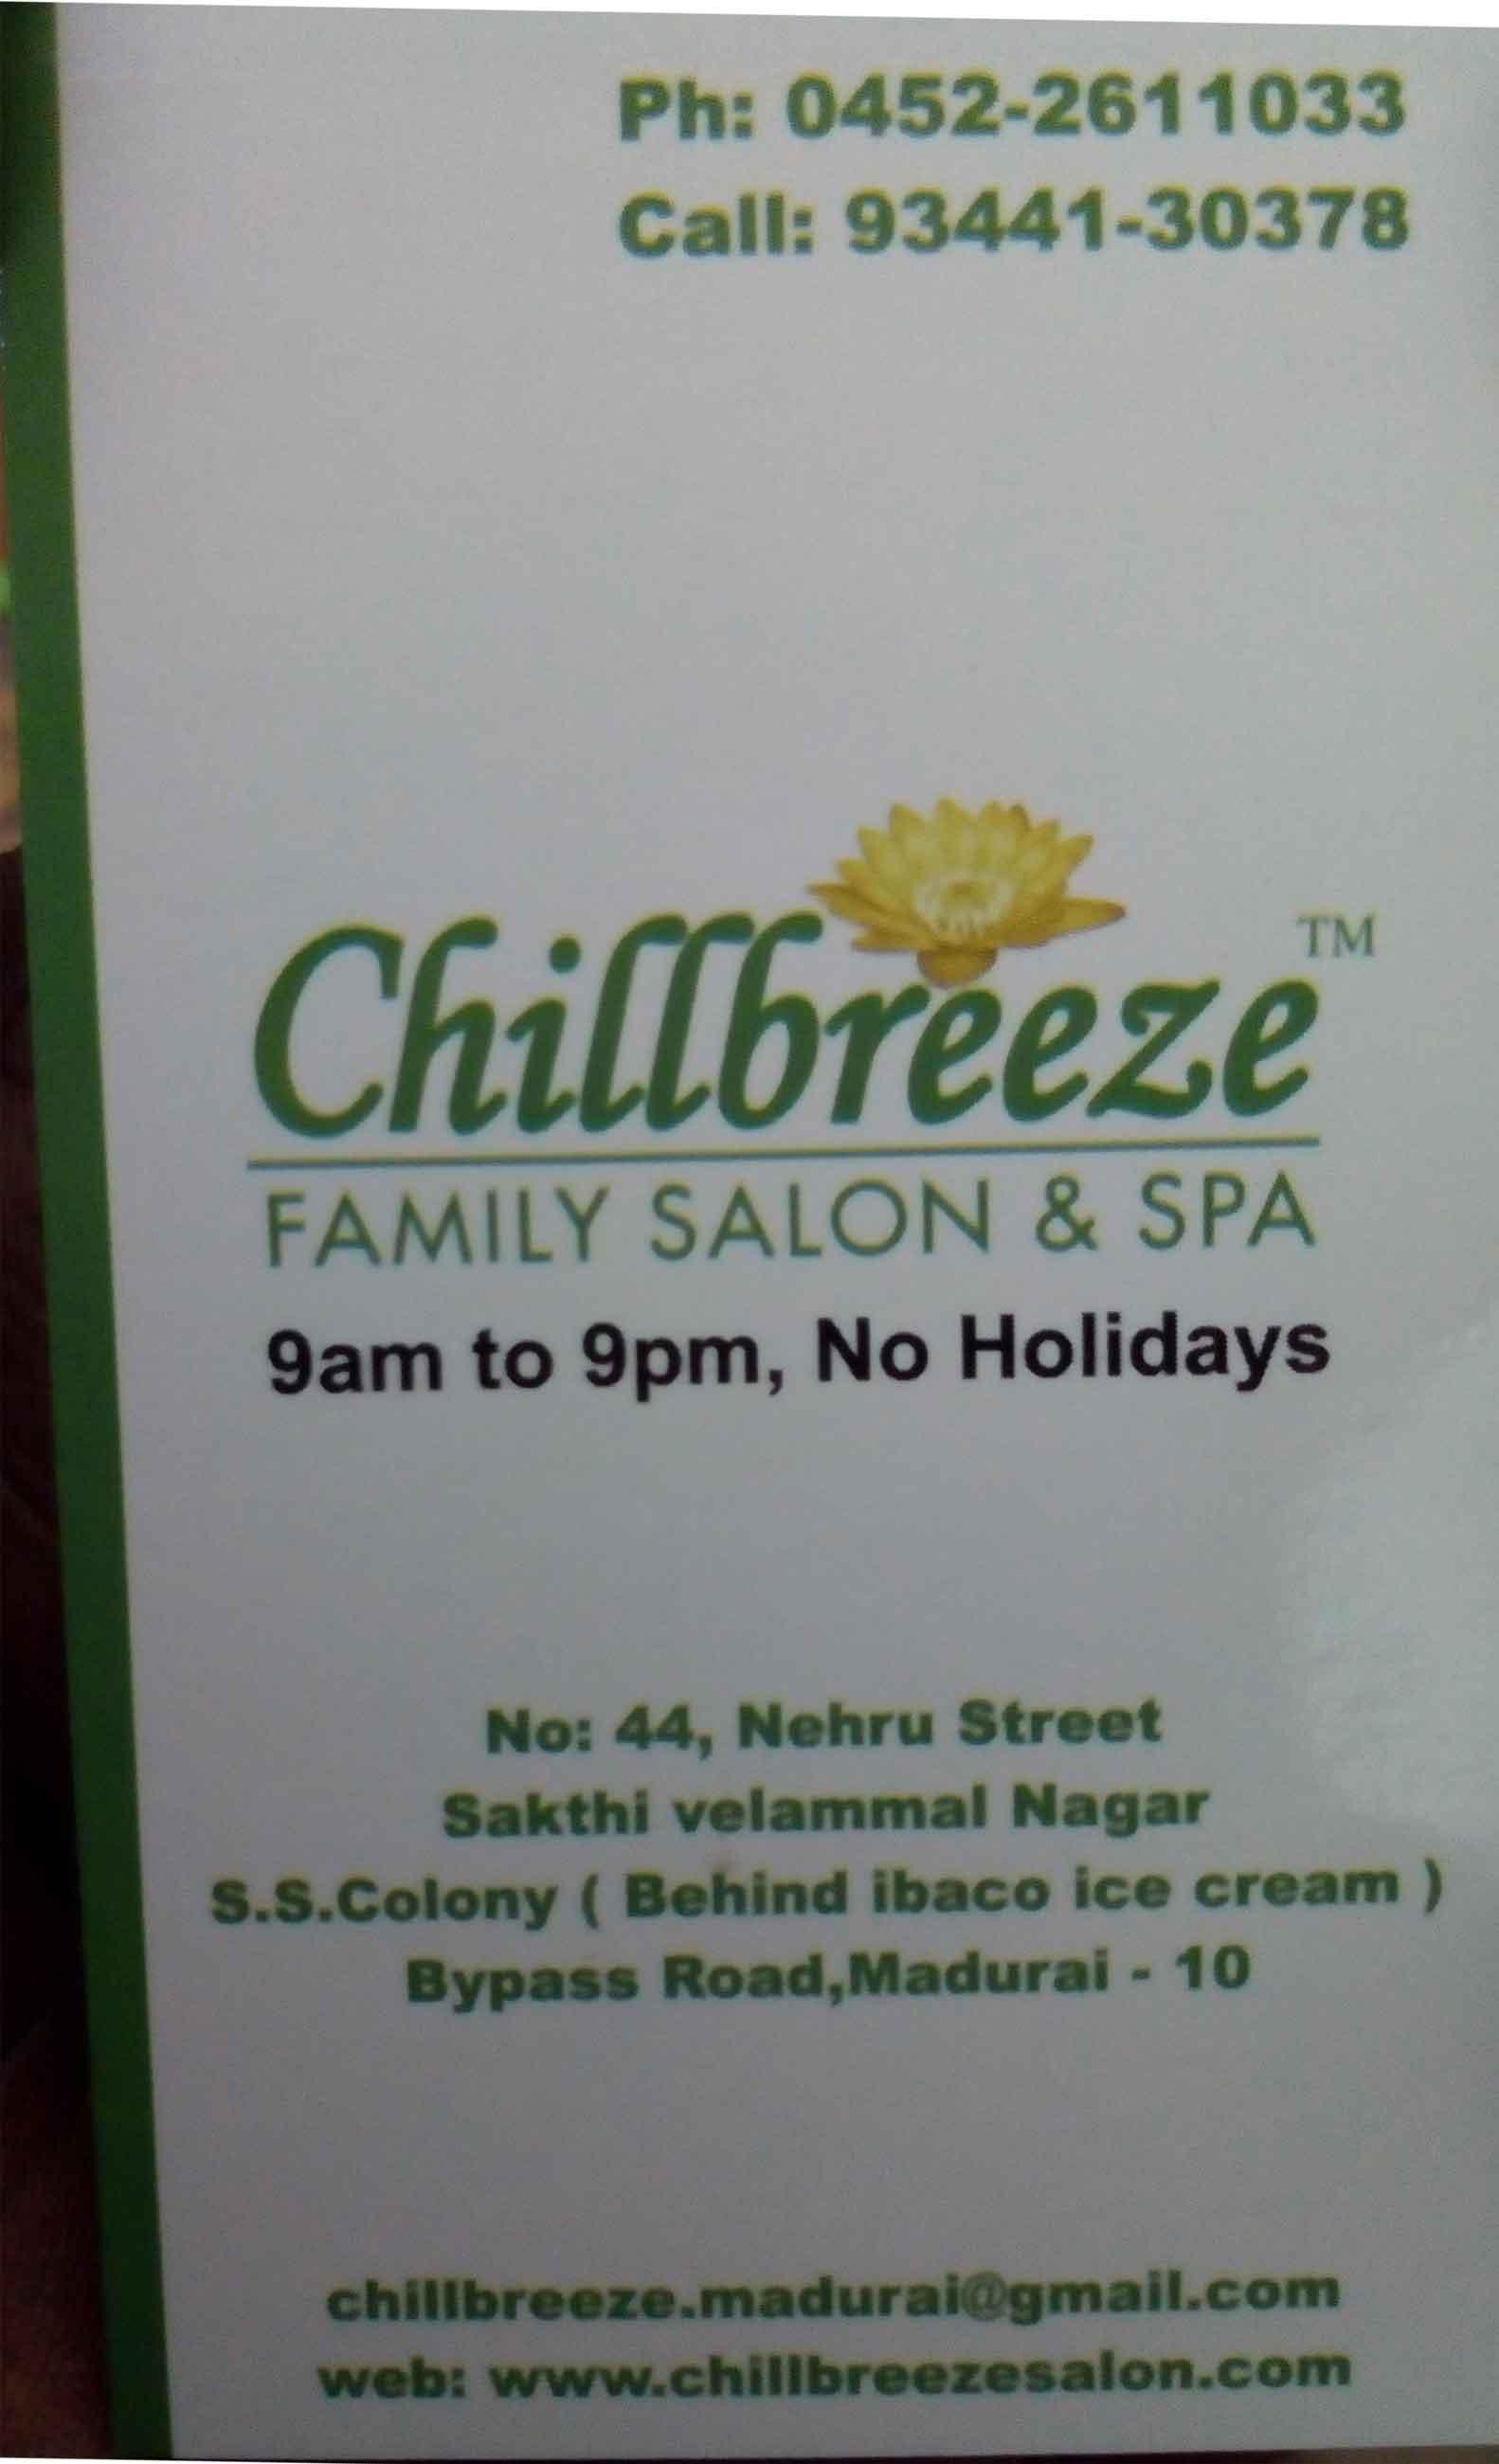 Chillbreeze Family Salon & Spa